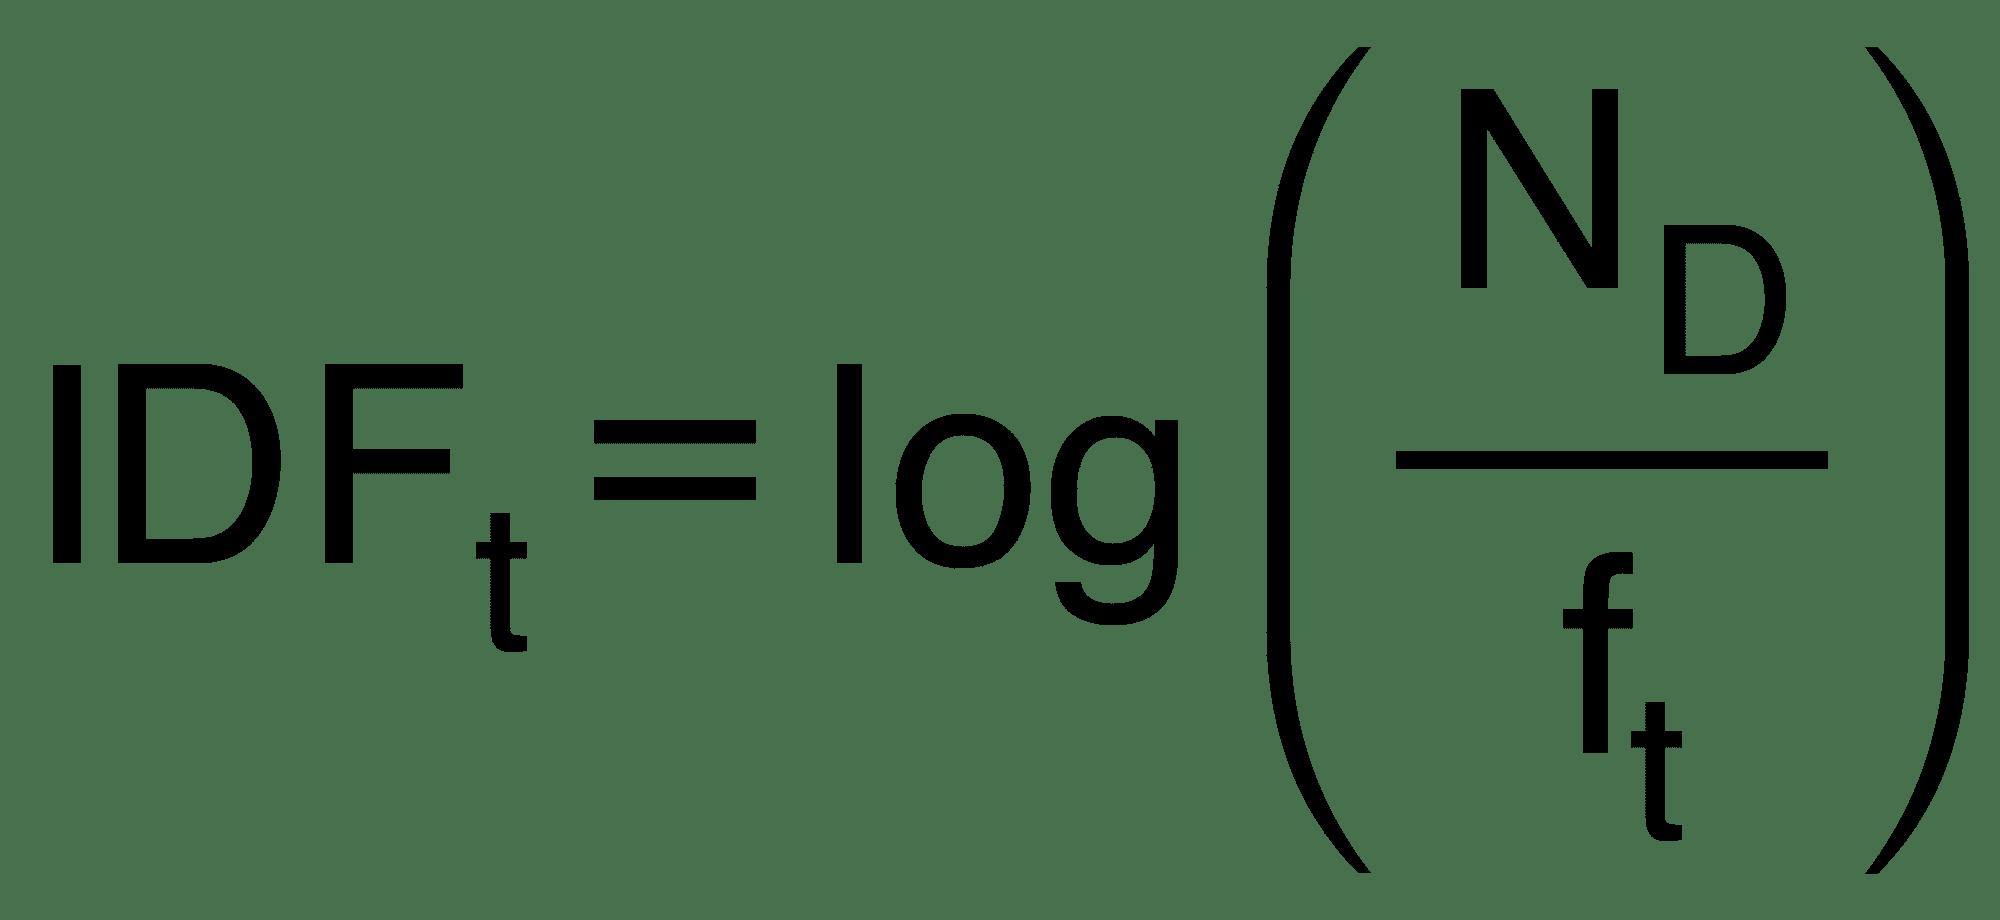 Inversen Dokumenthäufigkeit (IDF)